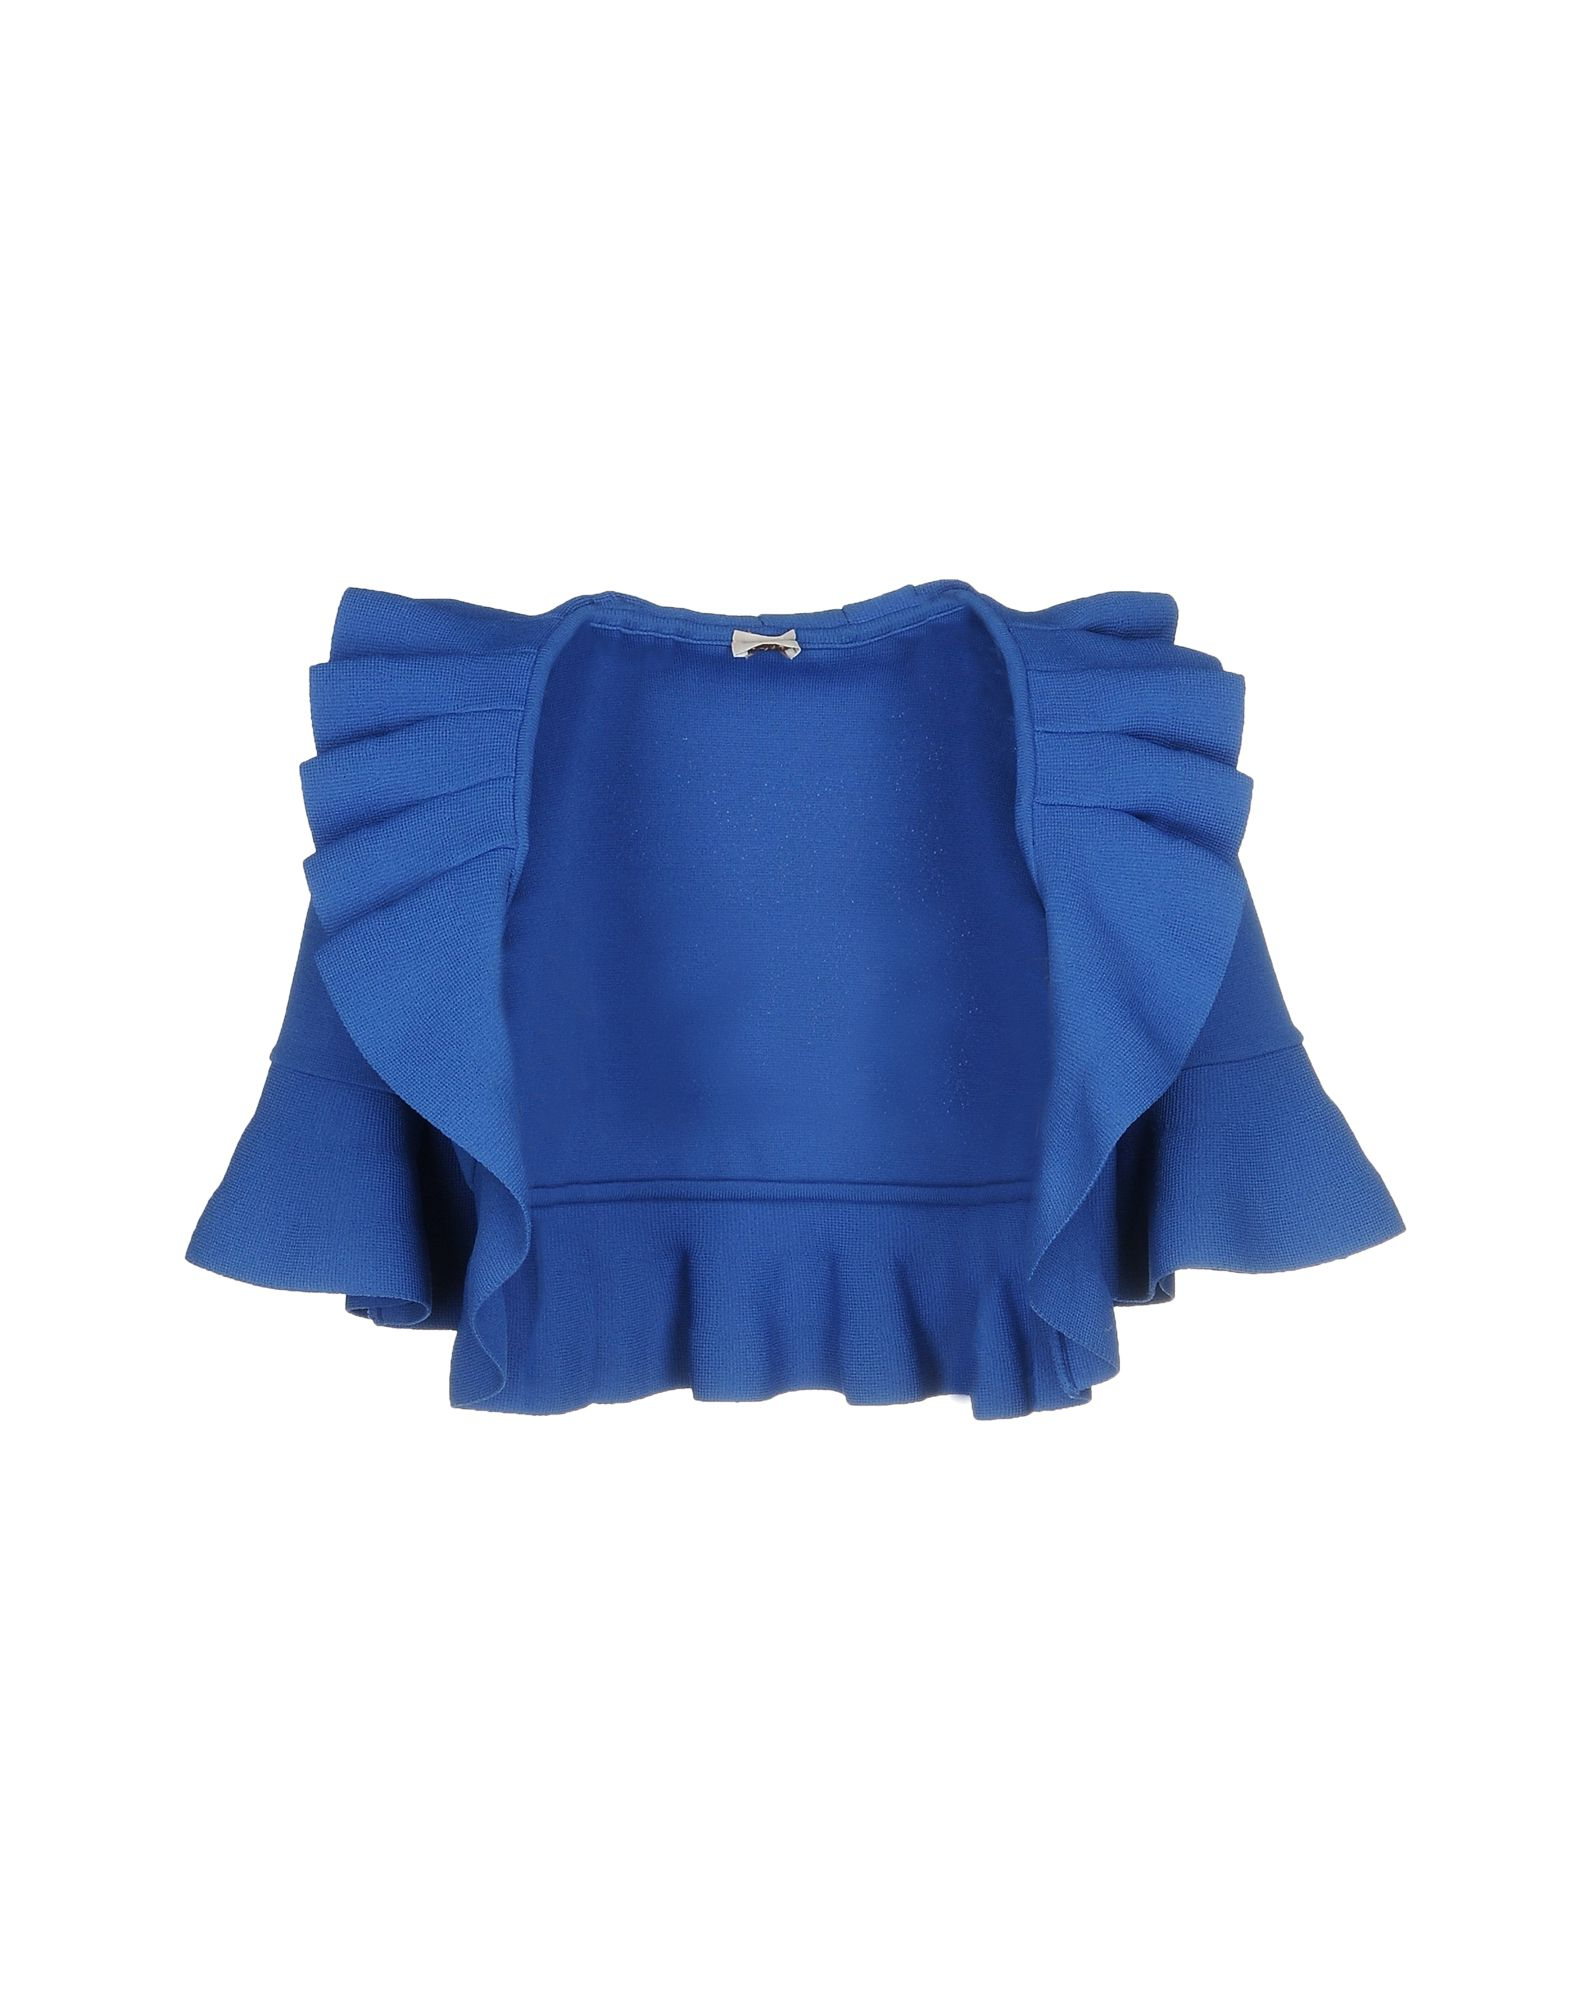 SATU´ Damen Bolero Farbe Königsblau Größe 4